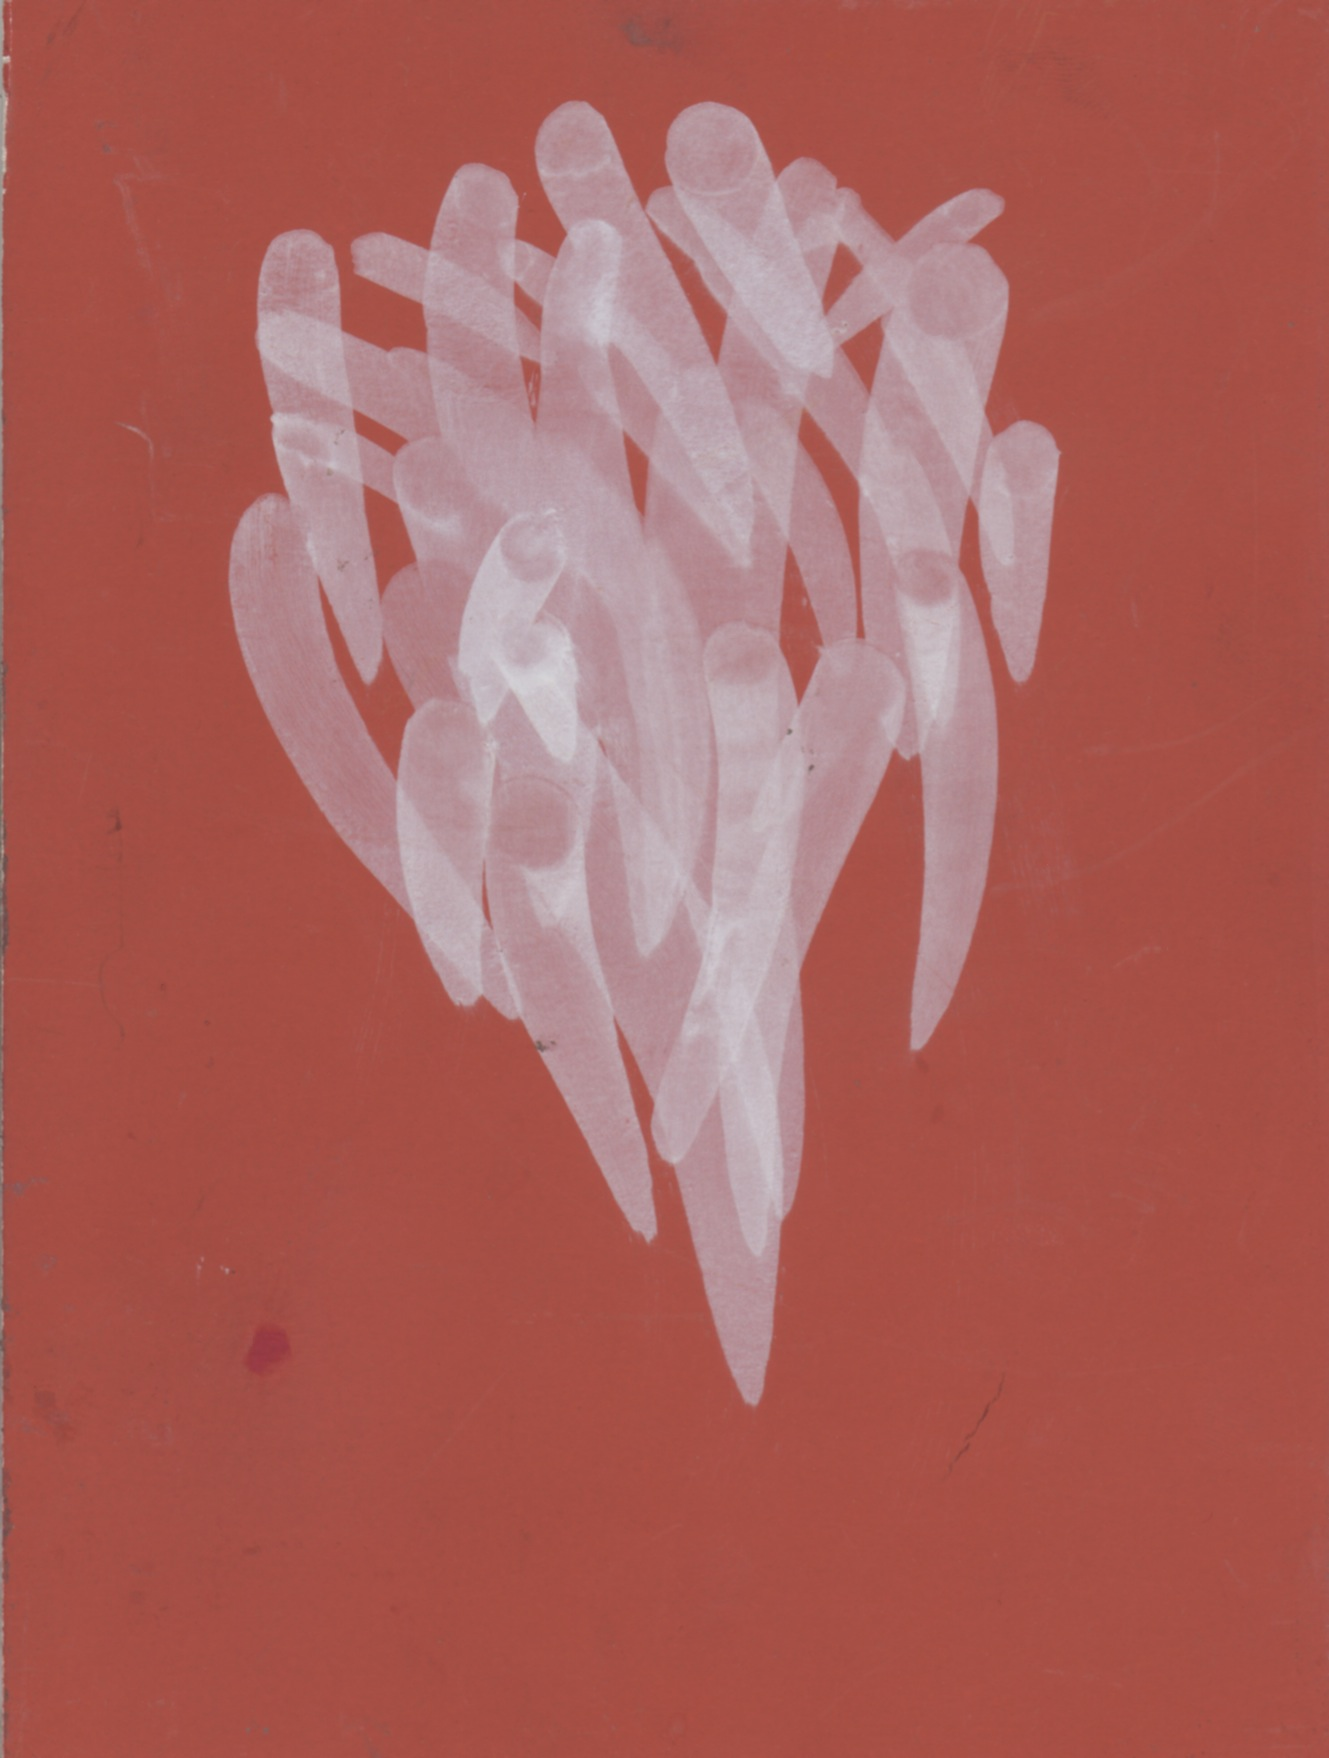 flowchart 10,  2012  ink on paper, 7 x 5 in